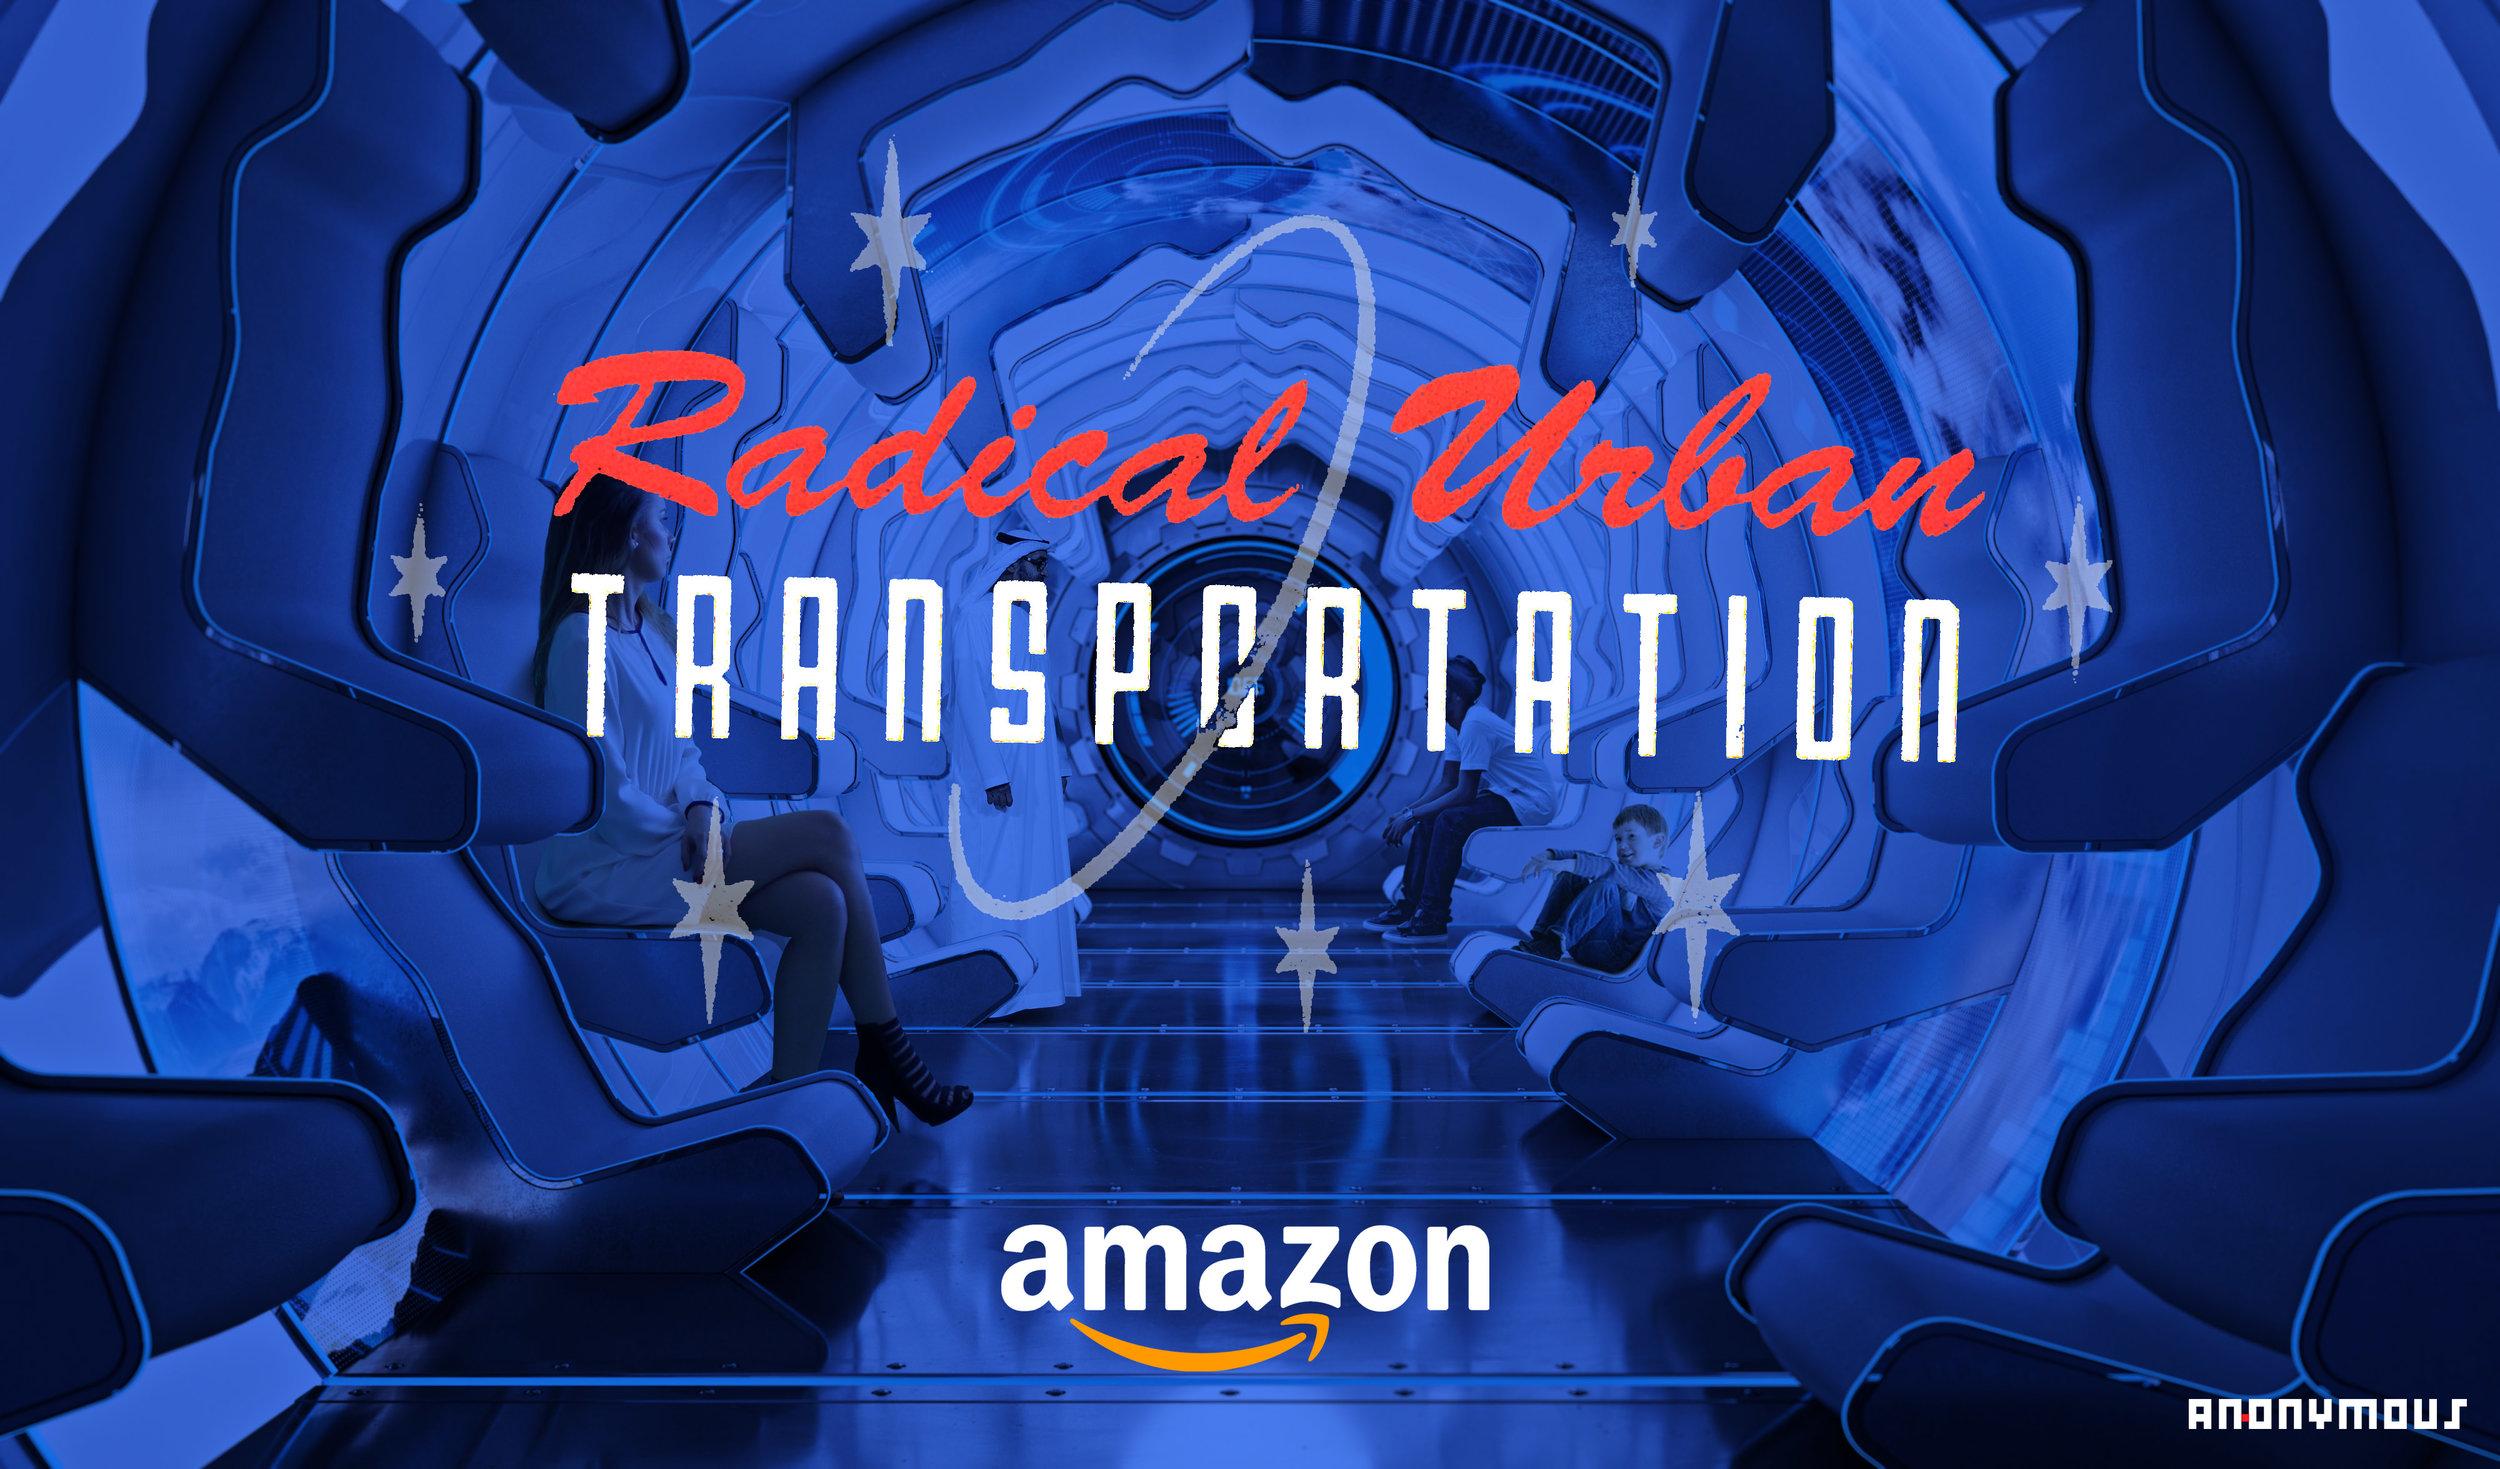 AMAZON_RADICAL URBAN TRANSPORATION_IMAN ANSARI_MARTA NOWAK